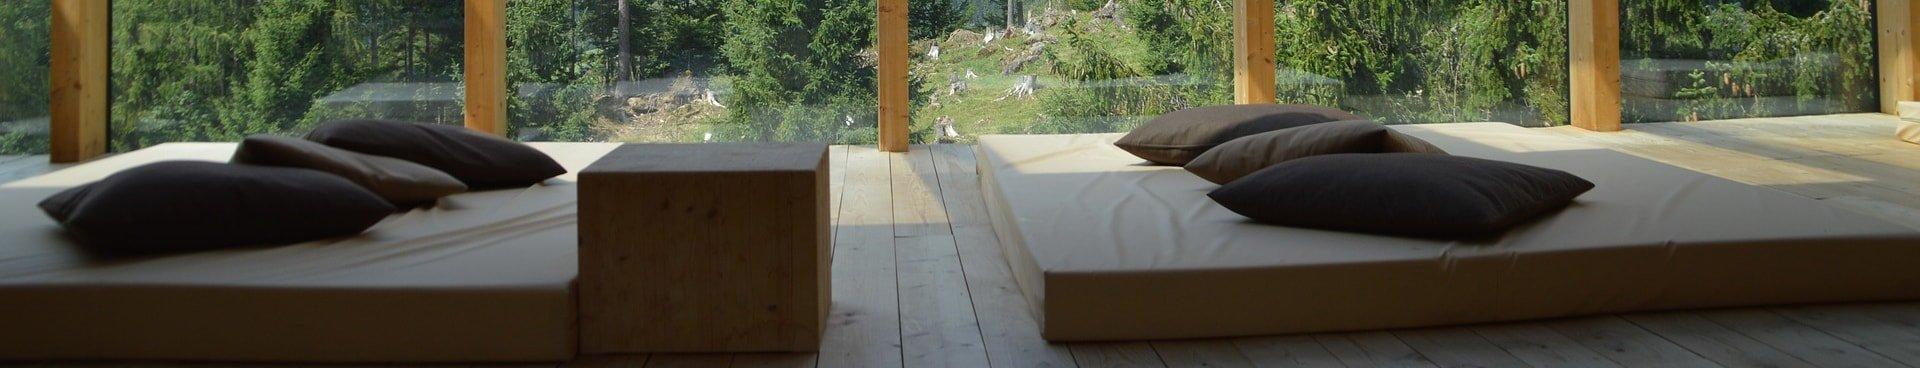 colchones aranda de duero - Makro Mueble